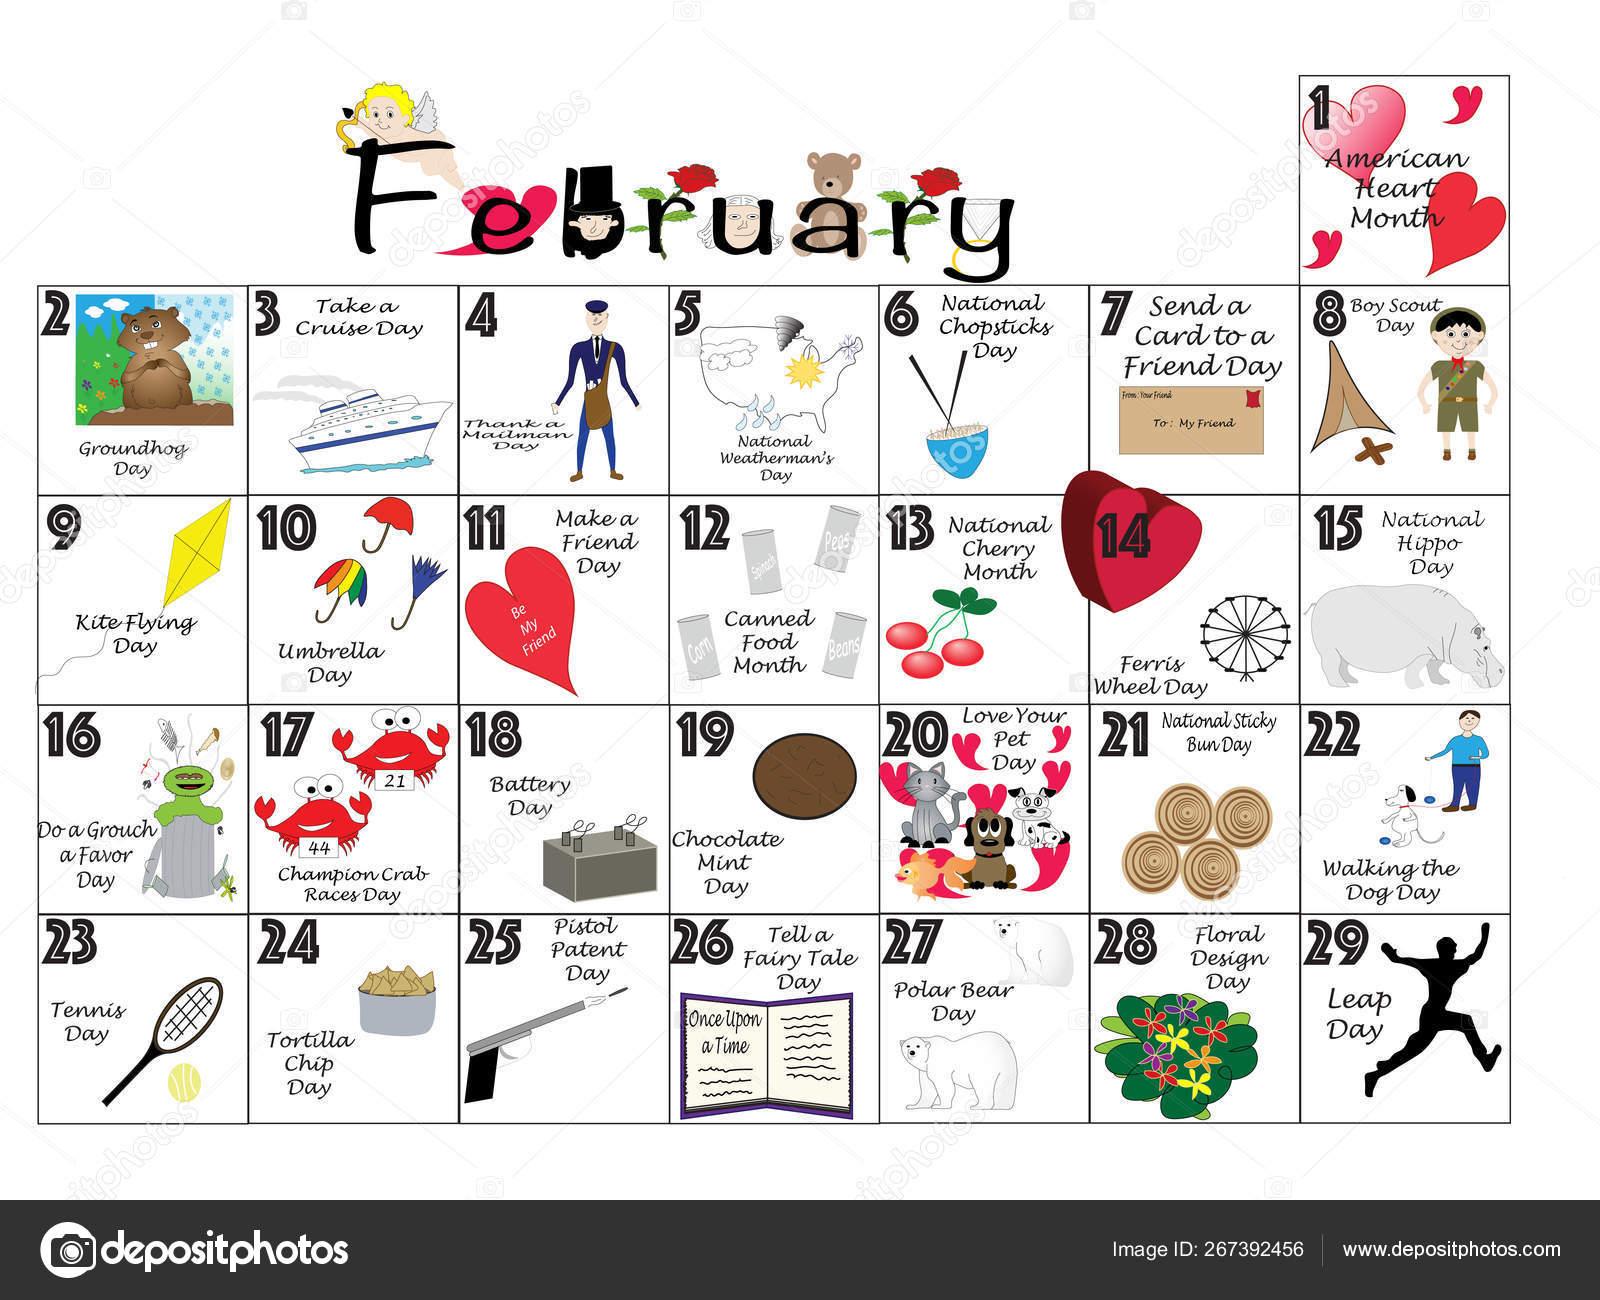 Calendar Clip Art February 2020 February 2020 Quirky Holidays and Unusual Celebrations Calendar